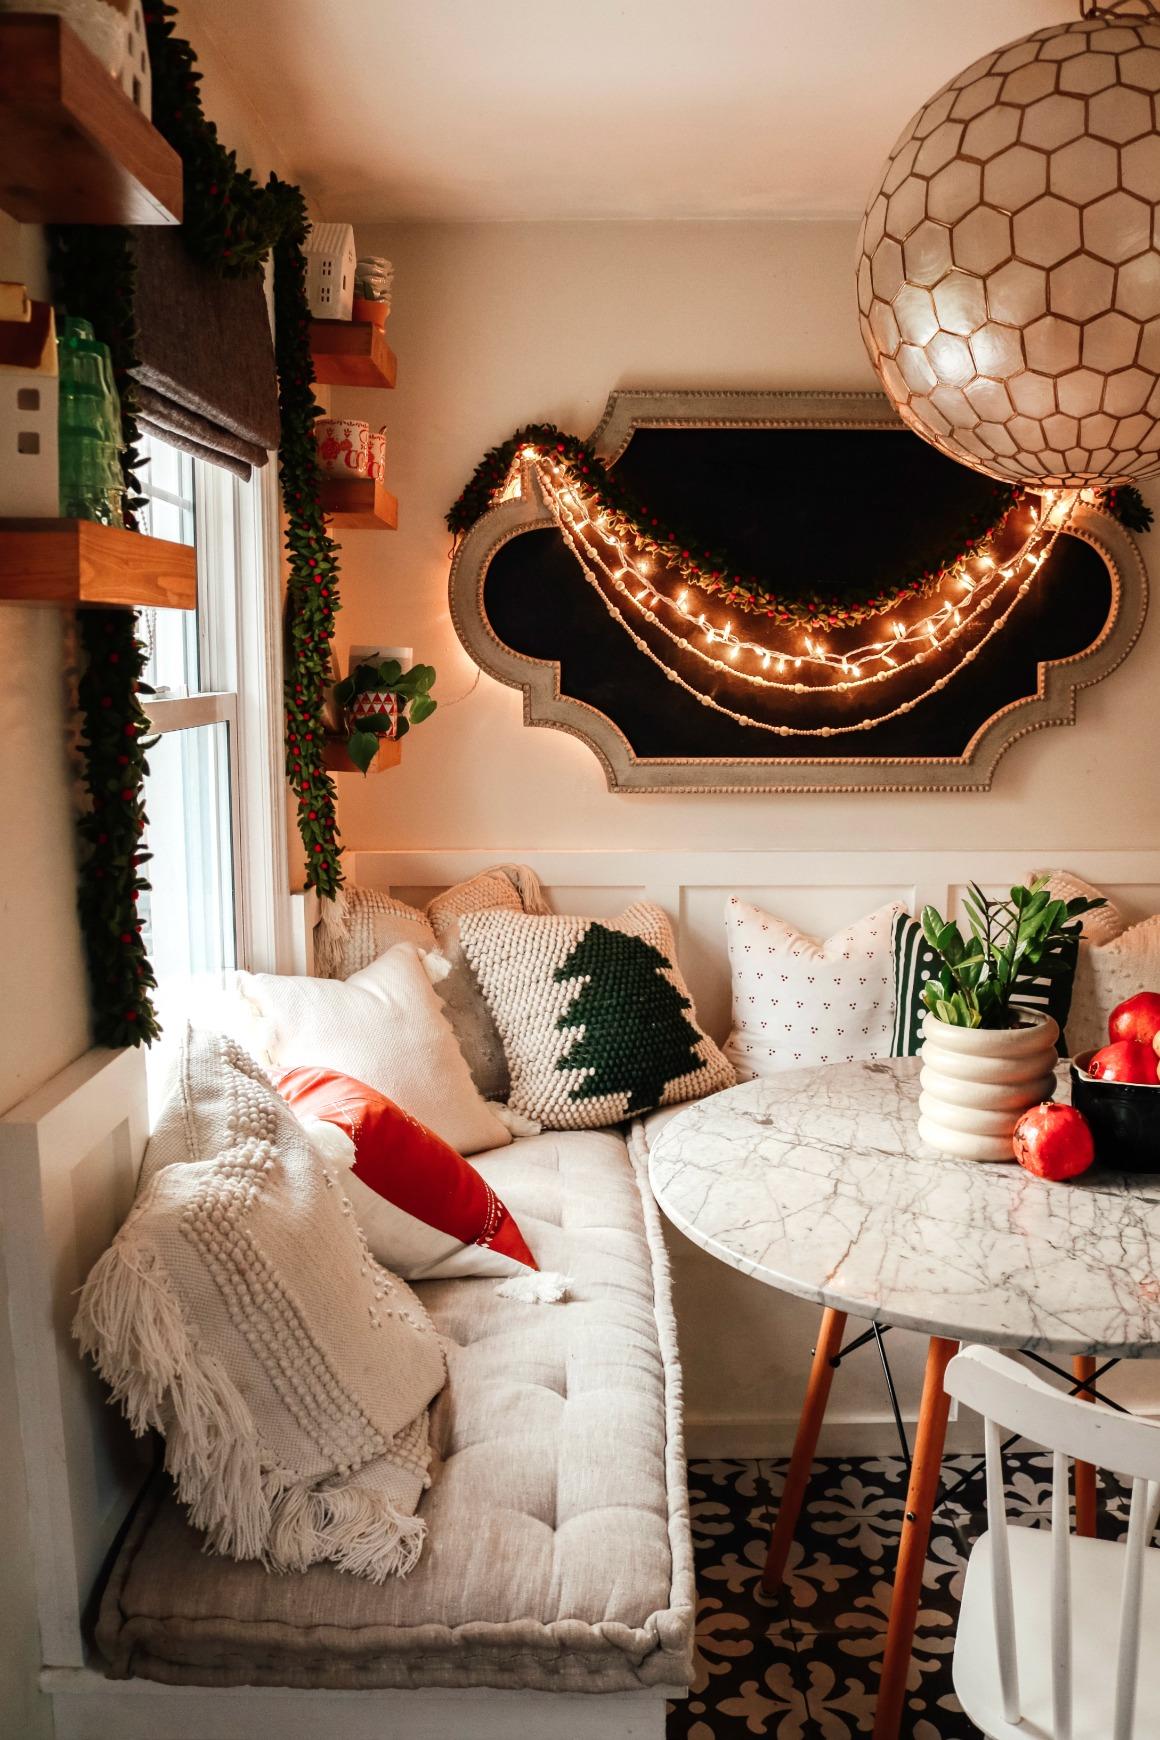 Top Christmas Decor Items